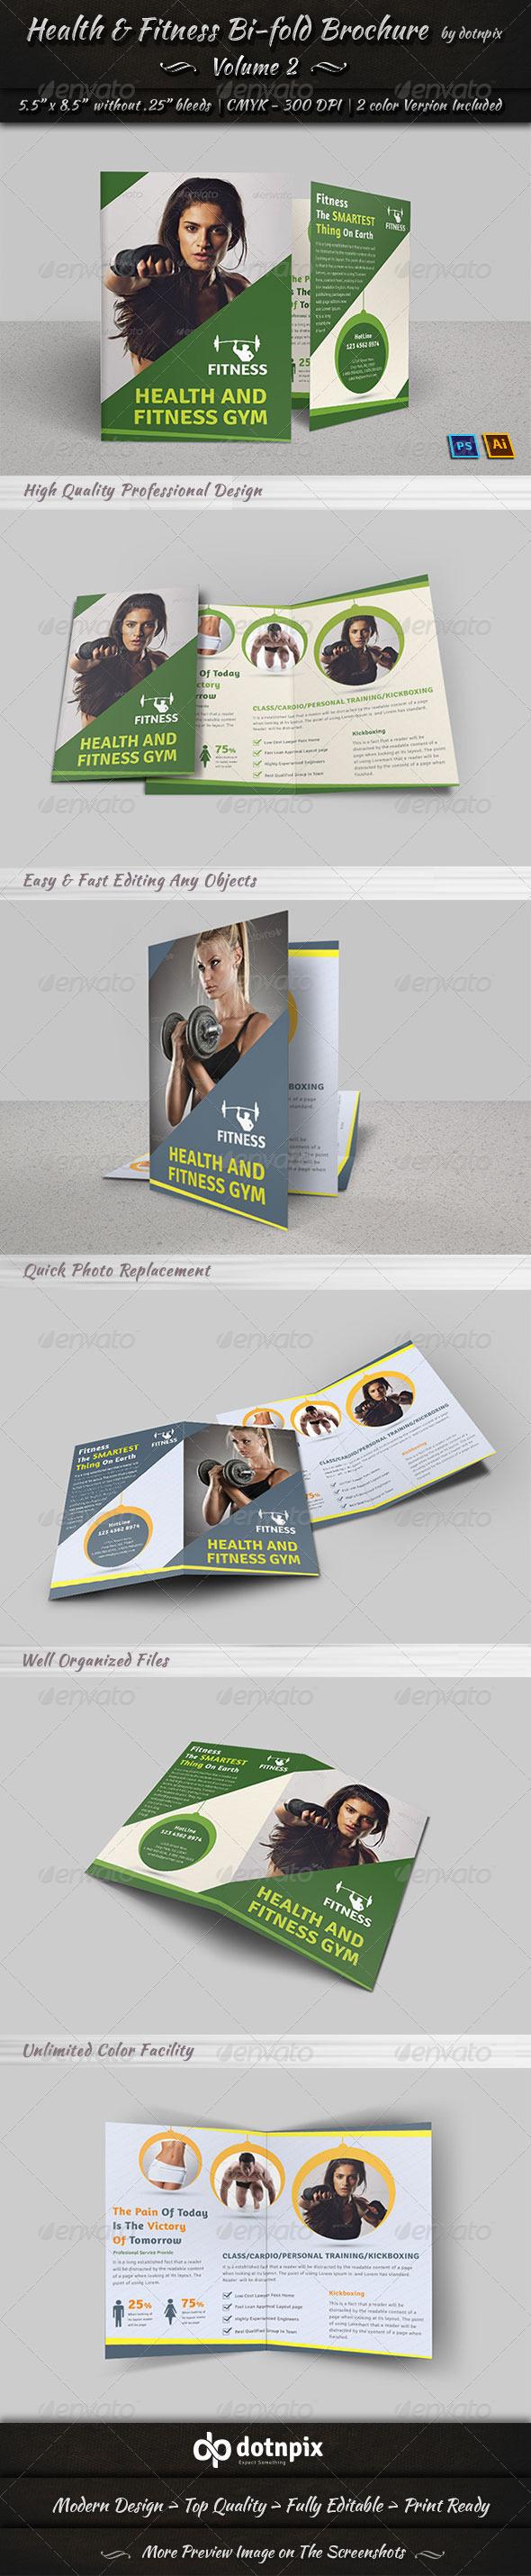 GraphicRiver Health & Fitness Bi-Fold Brochure Volume 2 7747248